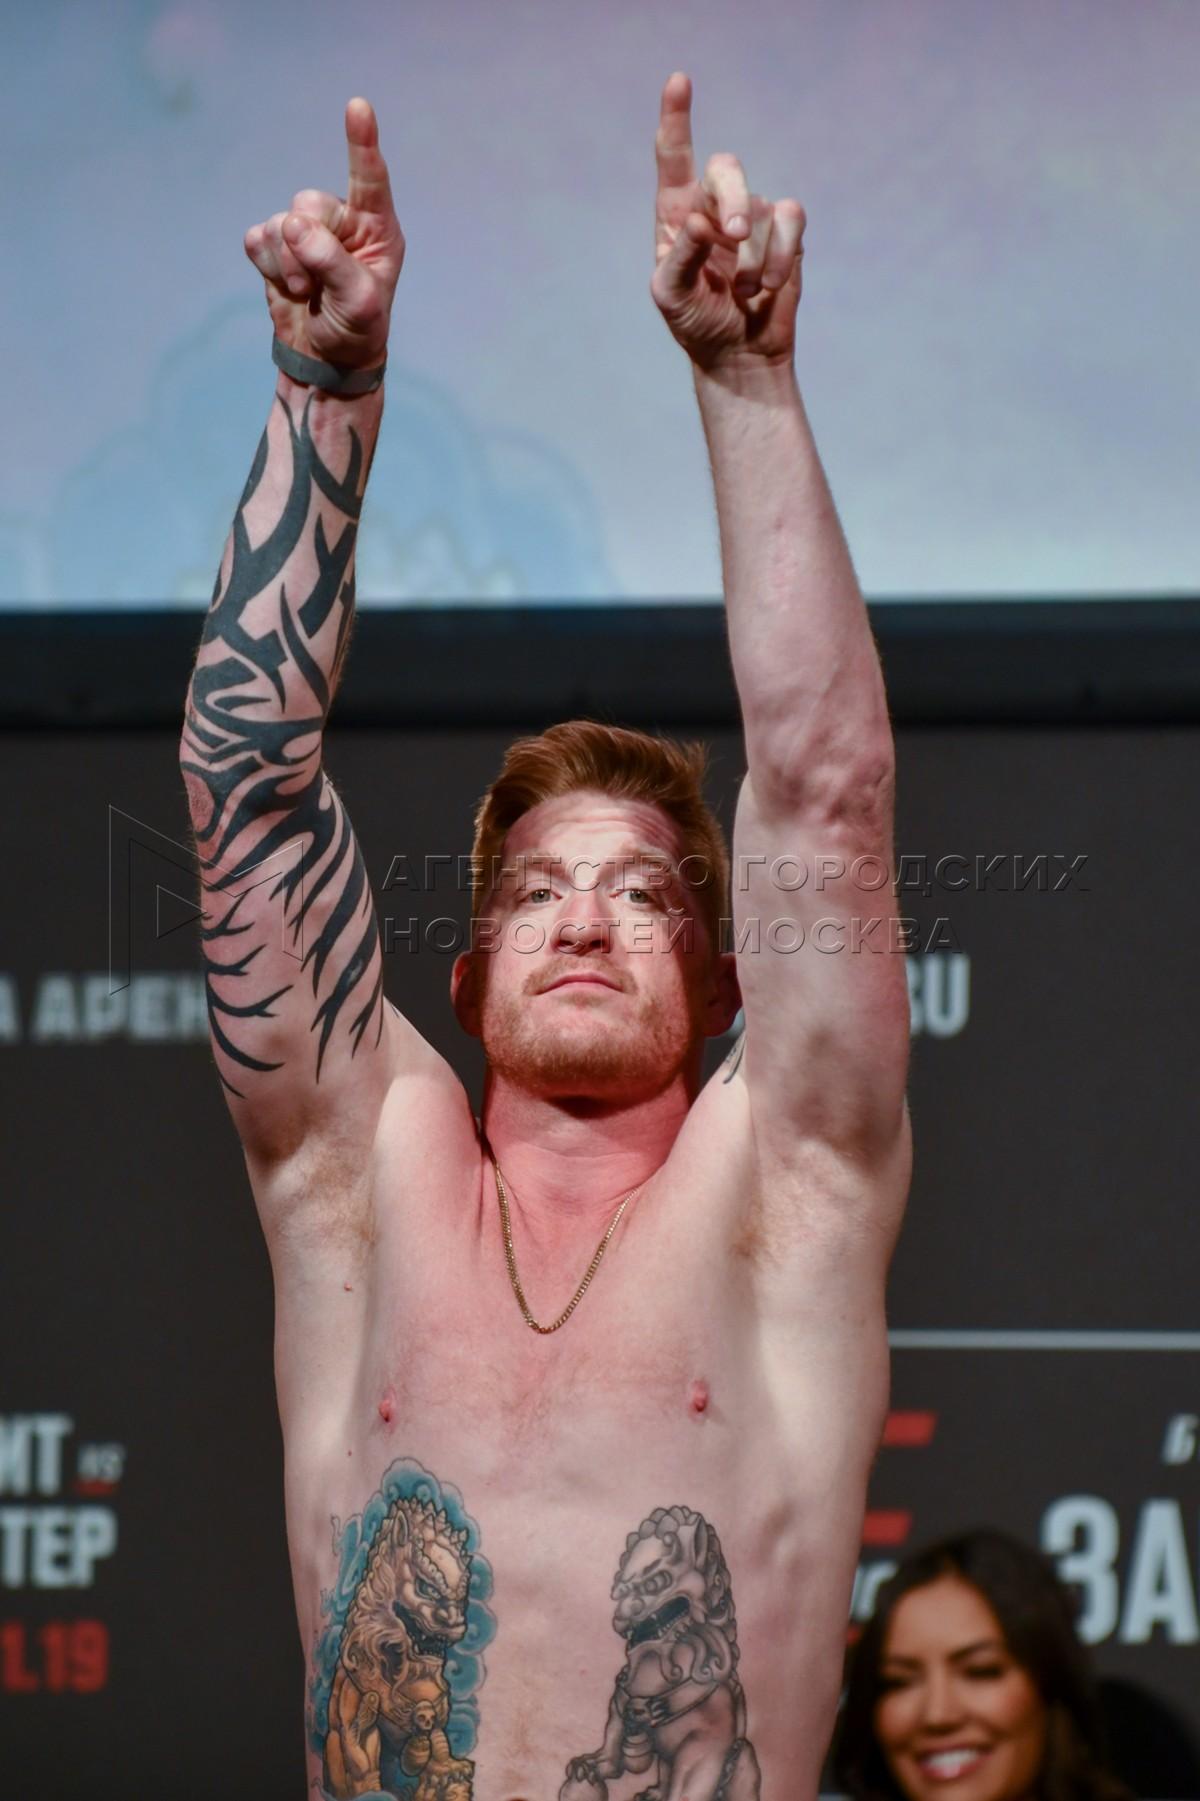 Американский боец смешанных единоборств Эд Герман во время церемонии взвешивания бойцов турнира UFC Fight Night Москва в спорткомплексе «ЦСКА Арена».